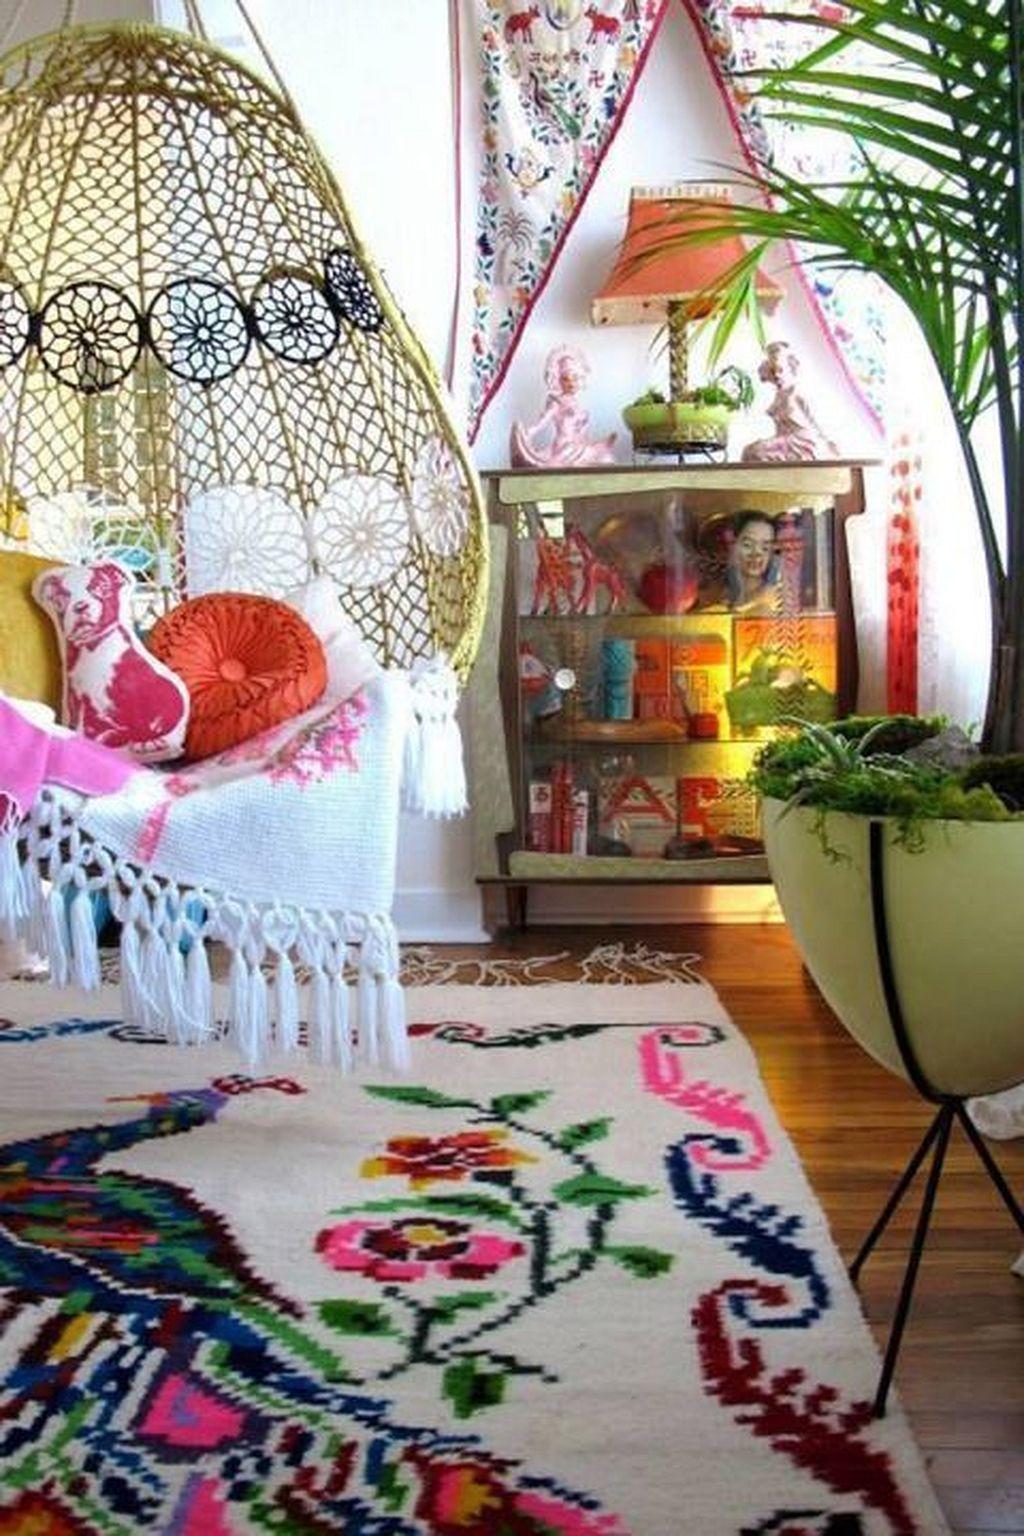 Unique hippie home decor 25 decoraci n boho estilos for Decoracion hogar hippie